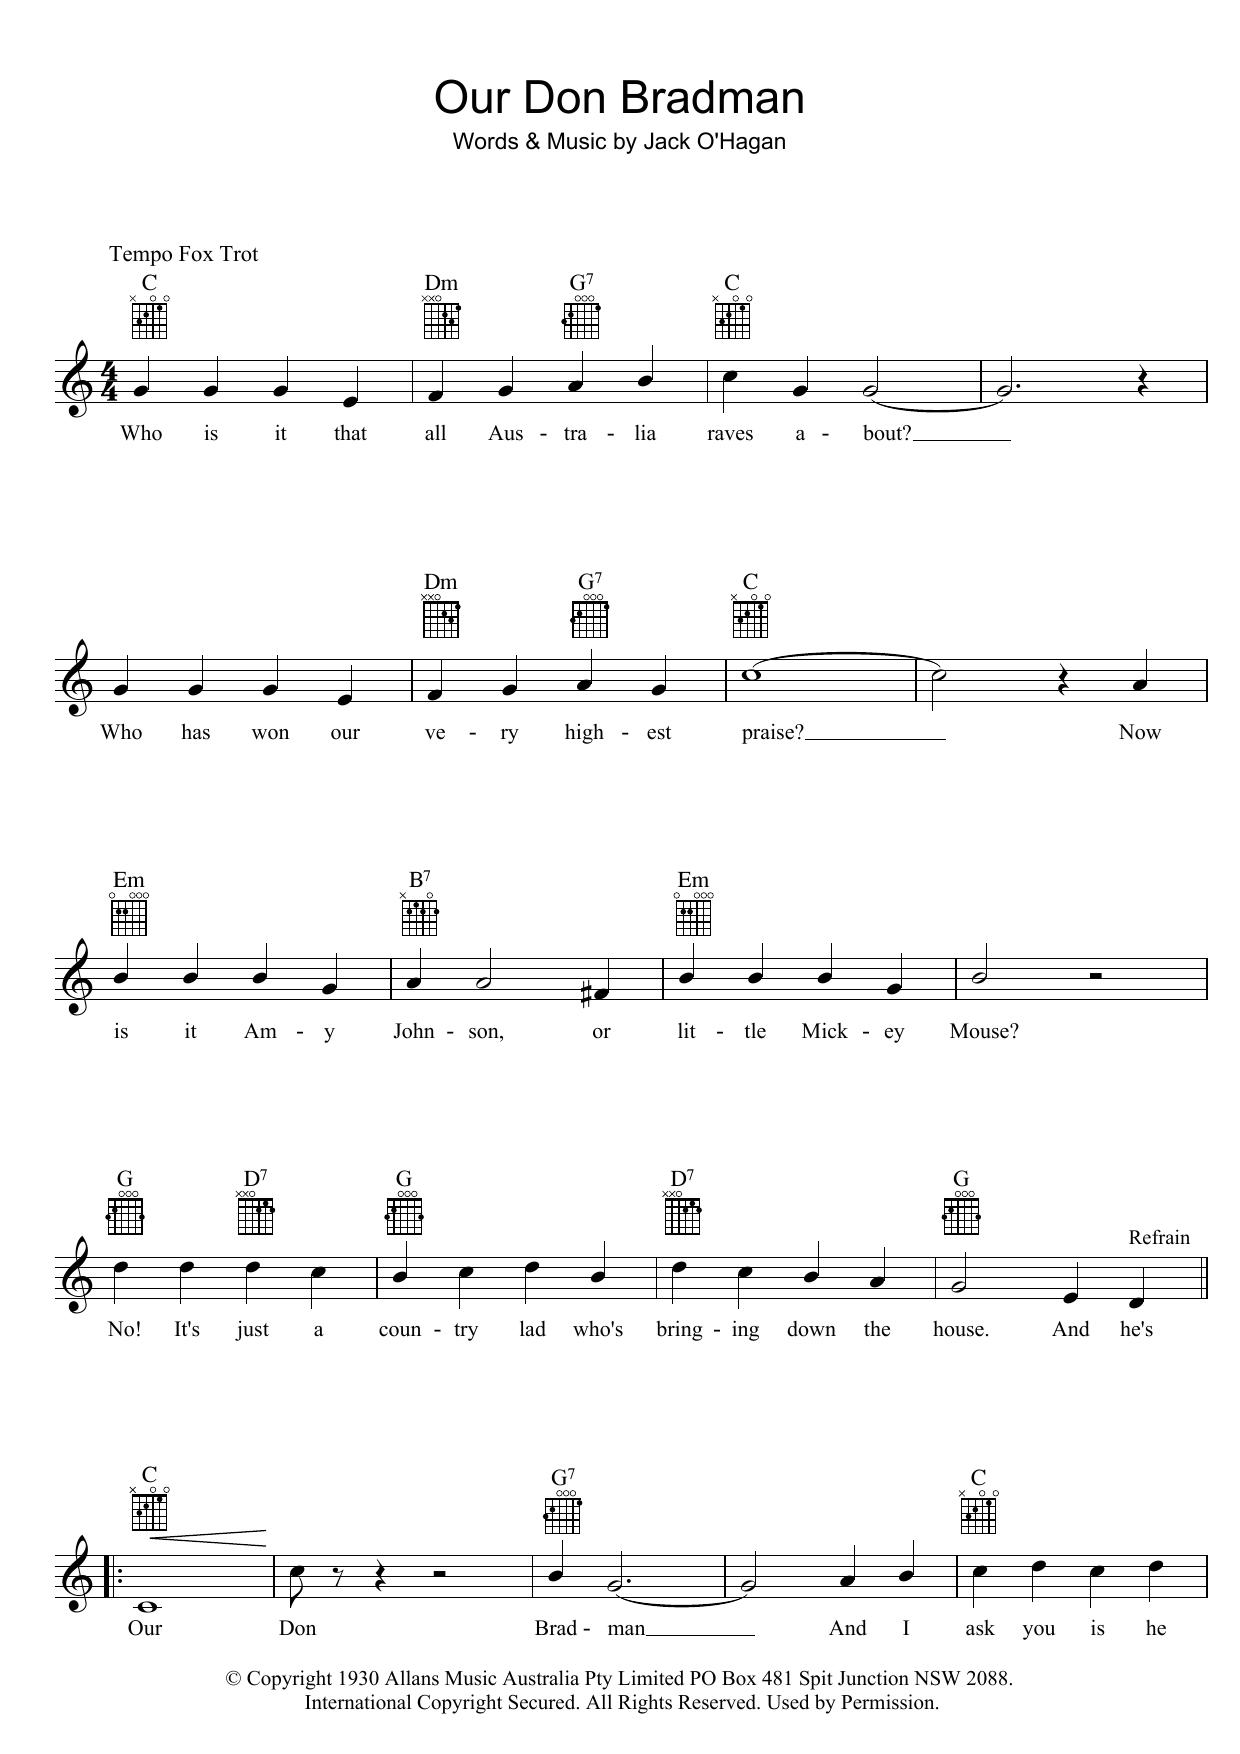 Our Don Bradman Sheet Music